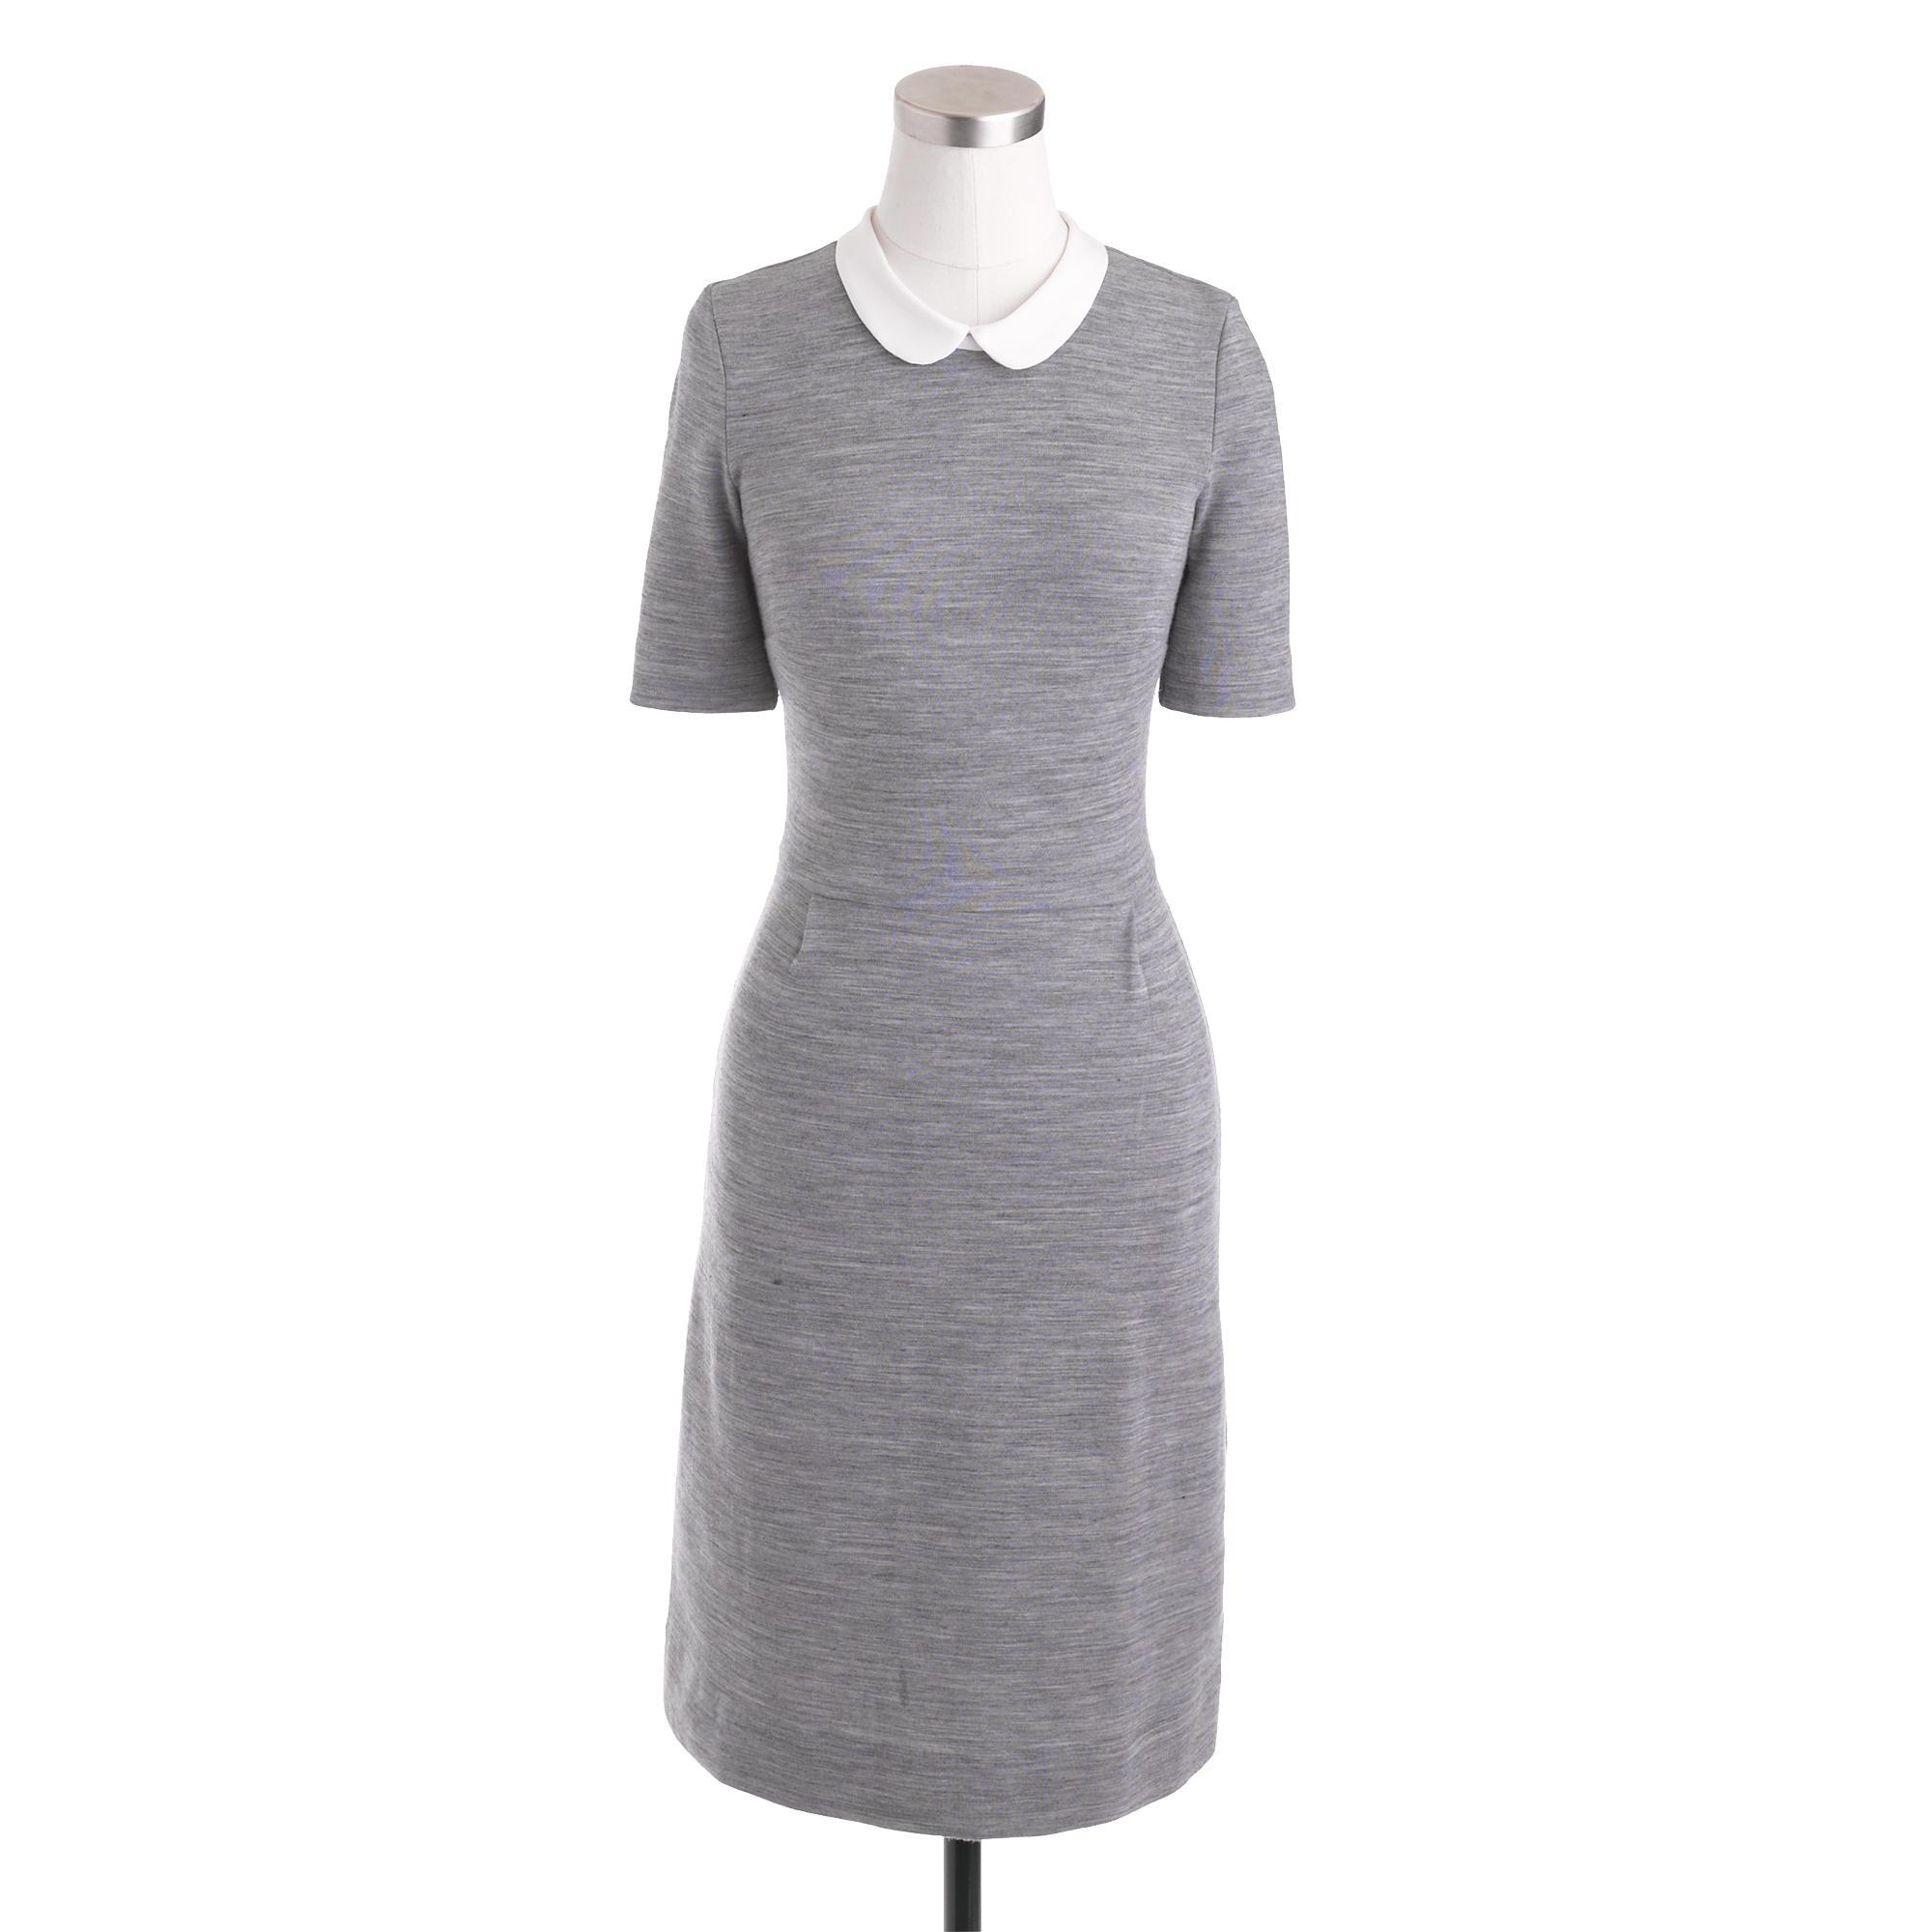 Black dress with white peter pan collar - Peter Pan Collar Dress Peter Pan Collar Dress